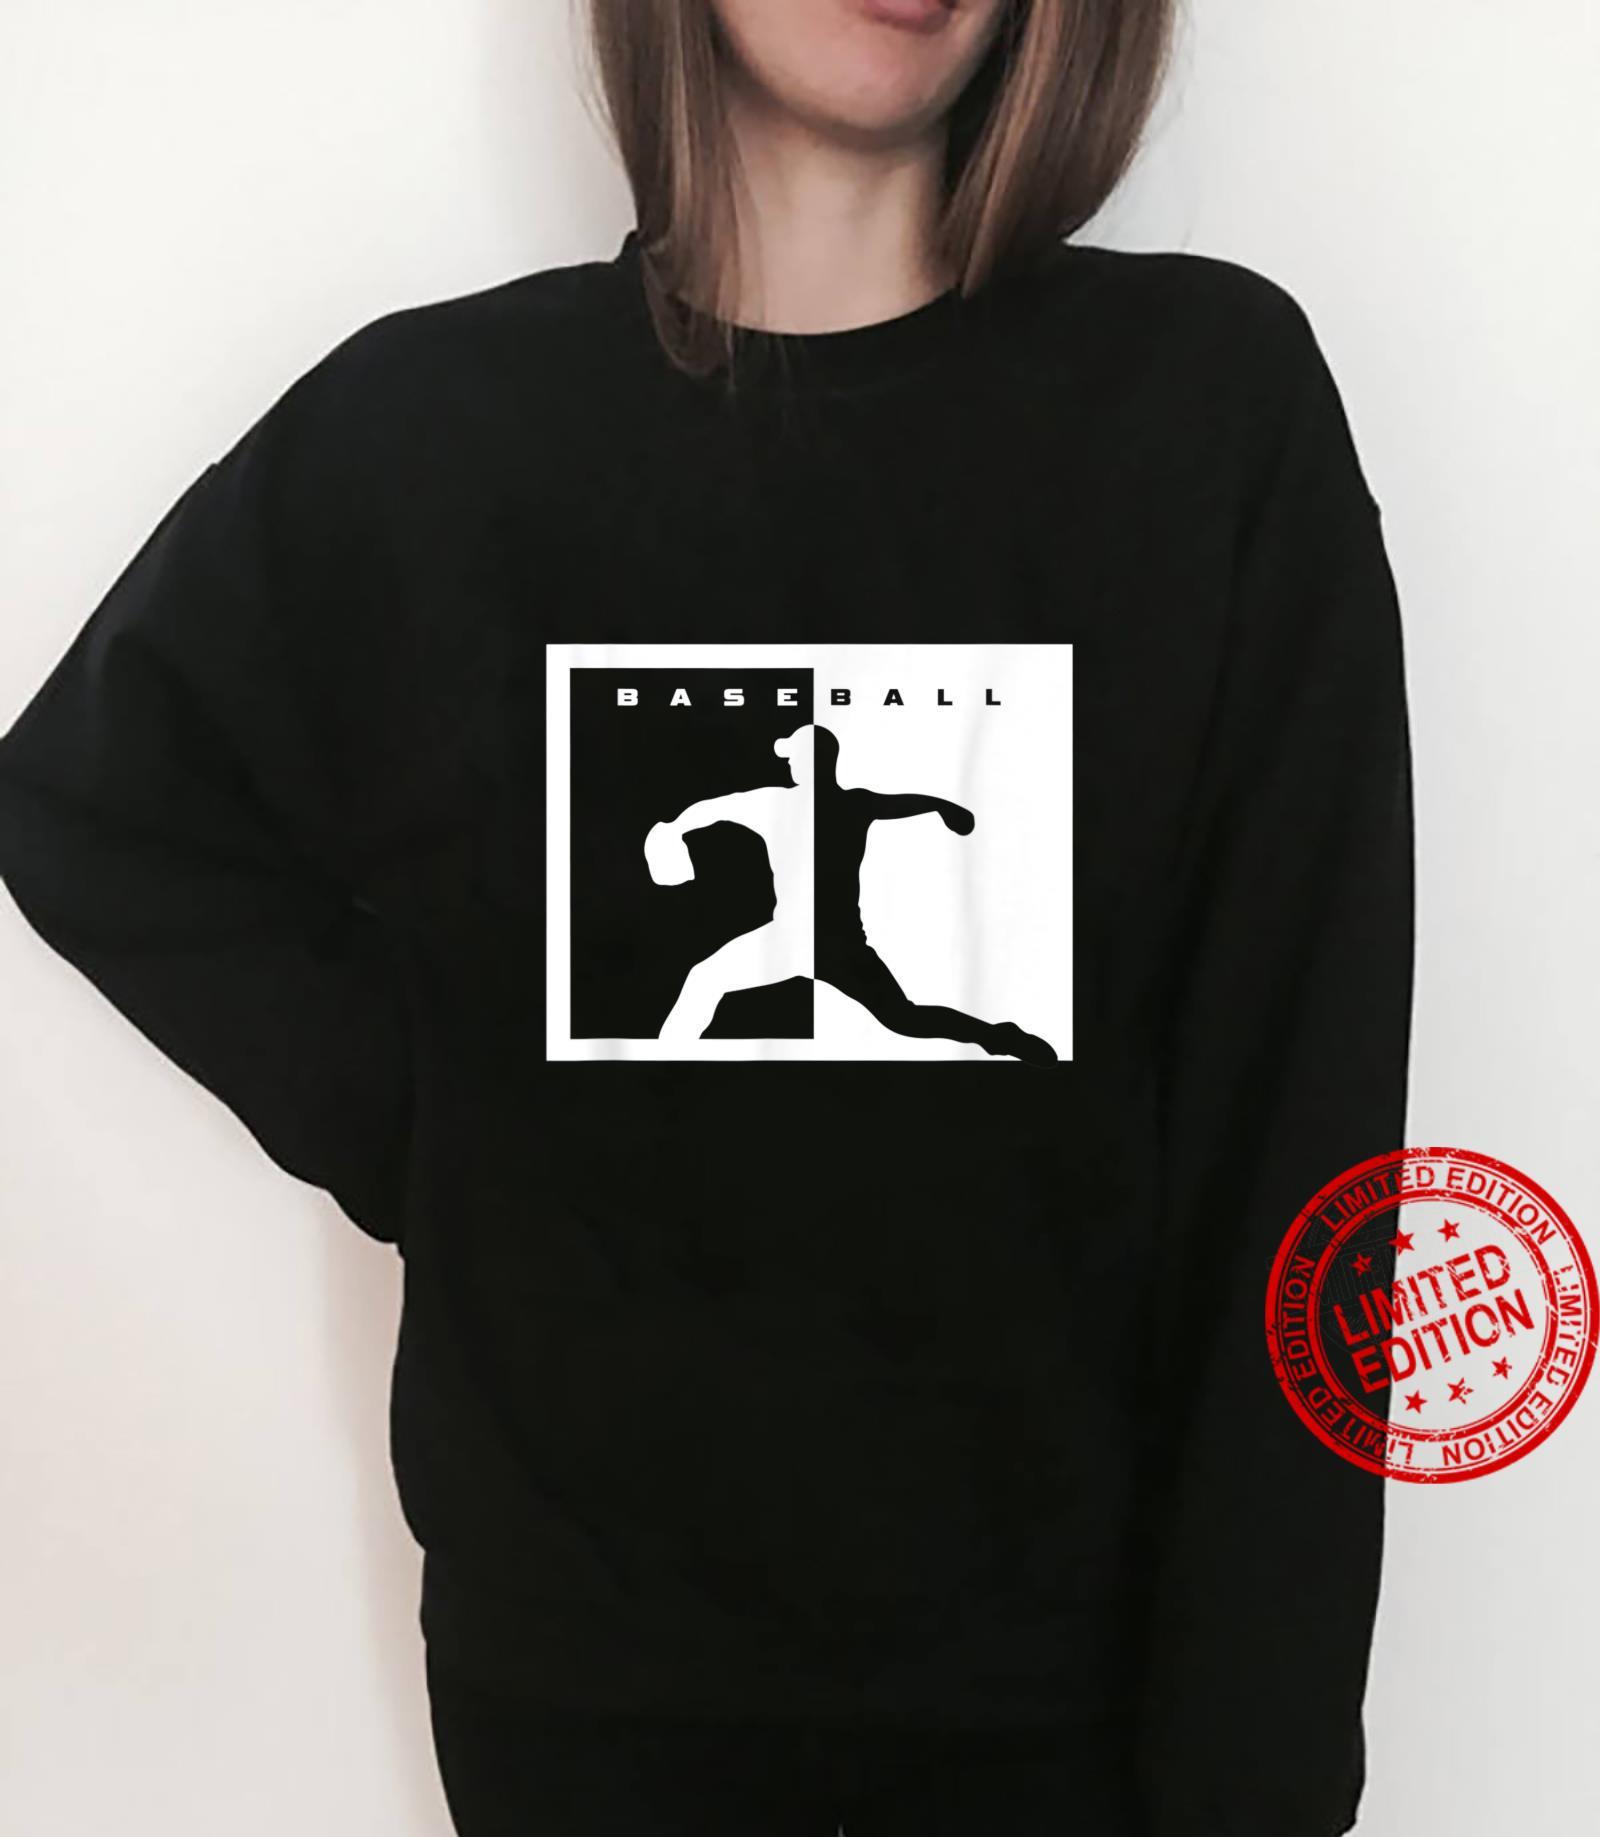 Baseball Pitcher Apparel Baseball Shirt sweater